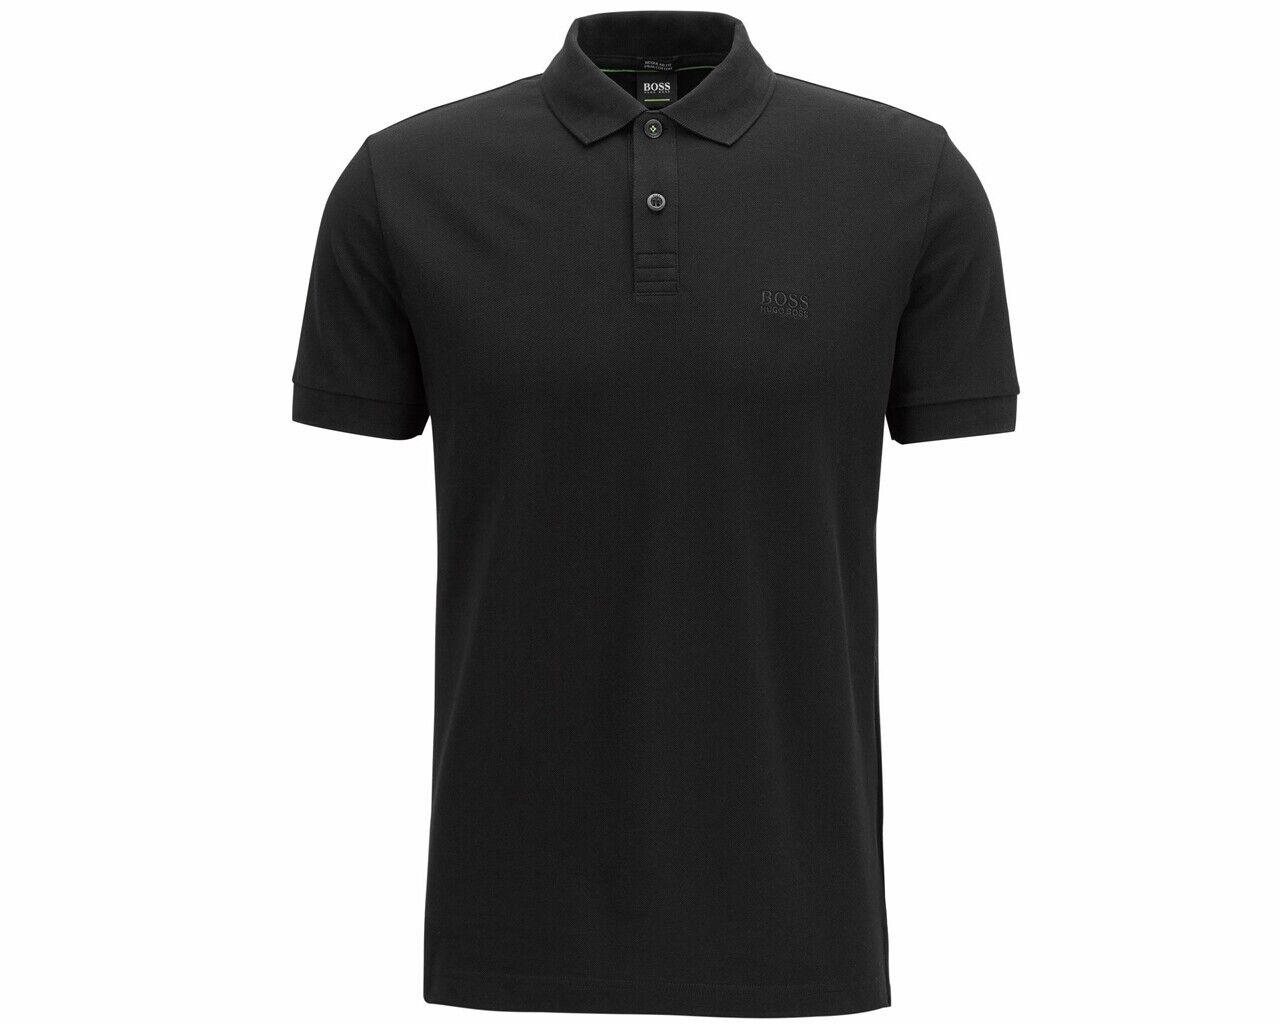 Hugo Boss Piro 50388956 001 Pima Cotton Mens Polo Shirt schwarz Top